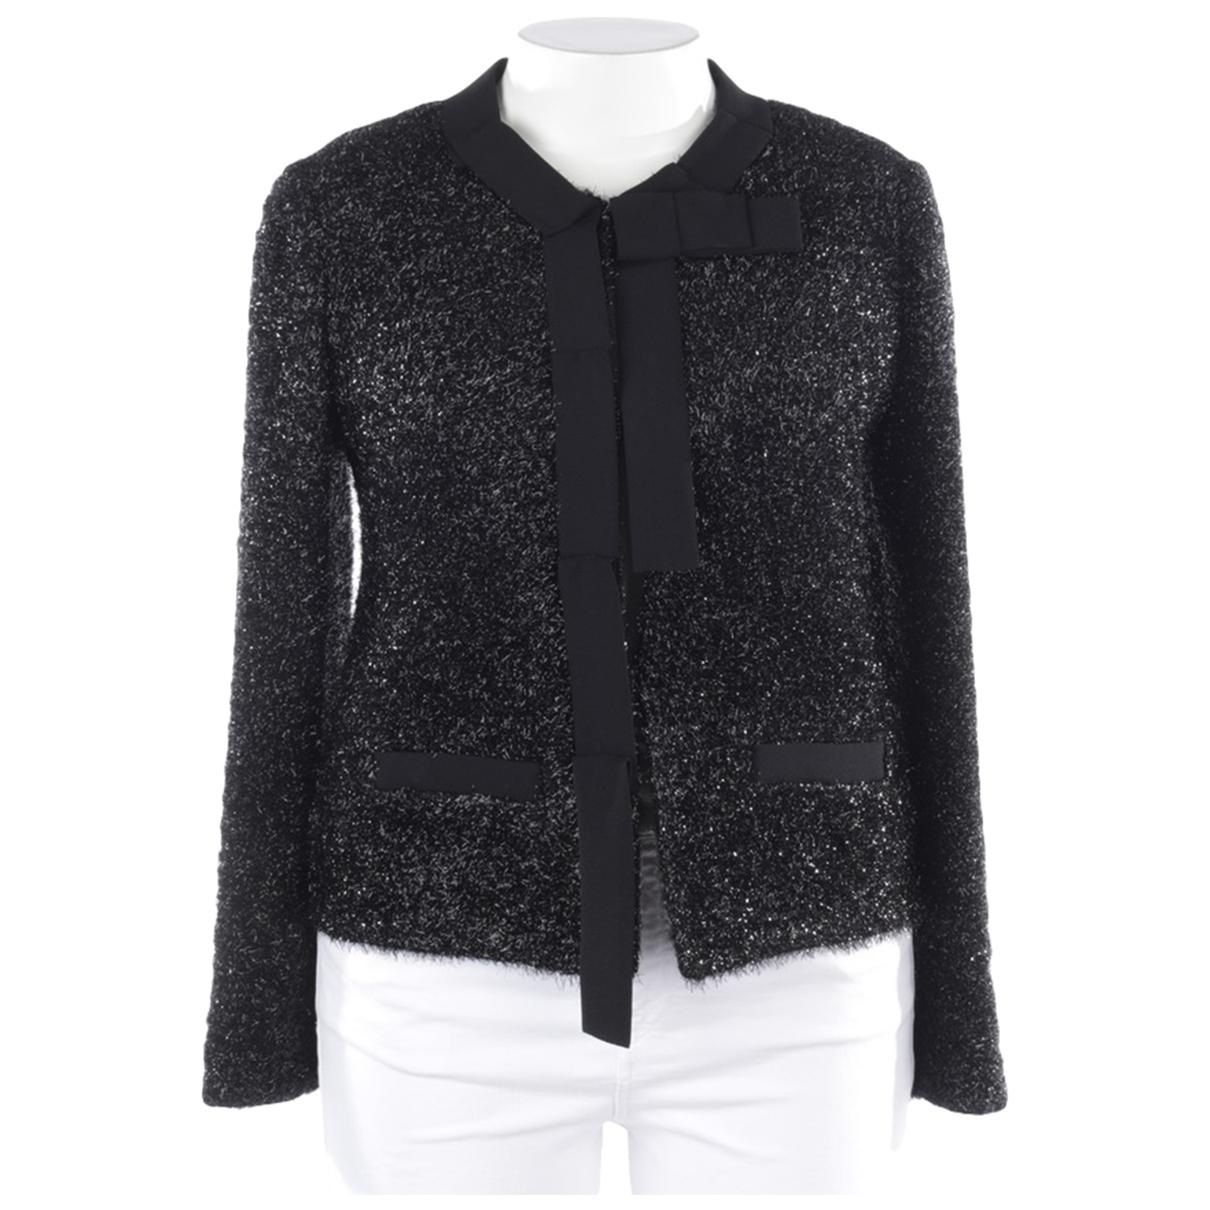 Shirtaporter \N Jacke in  Schwarz Polyester